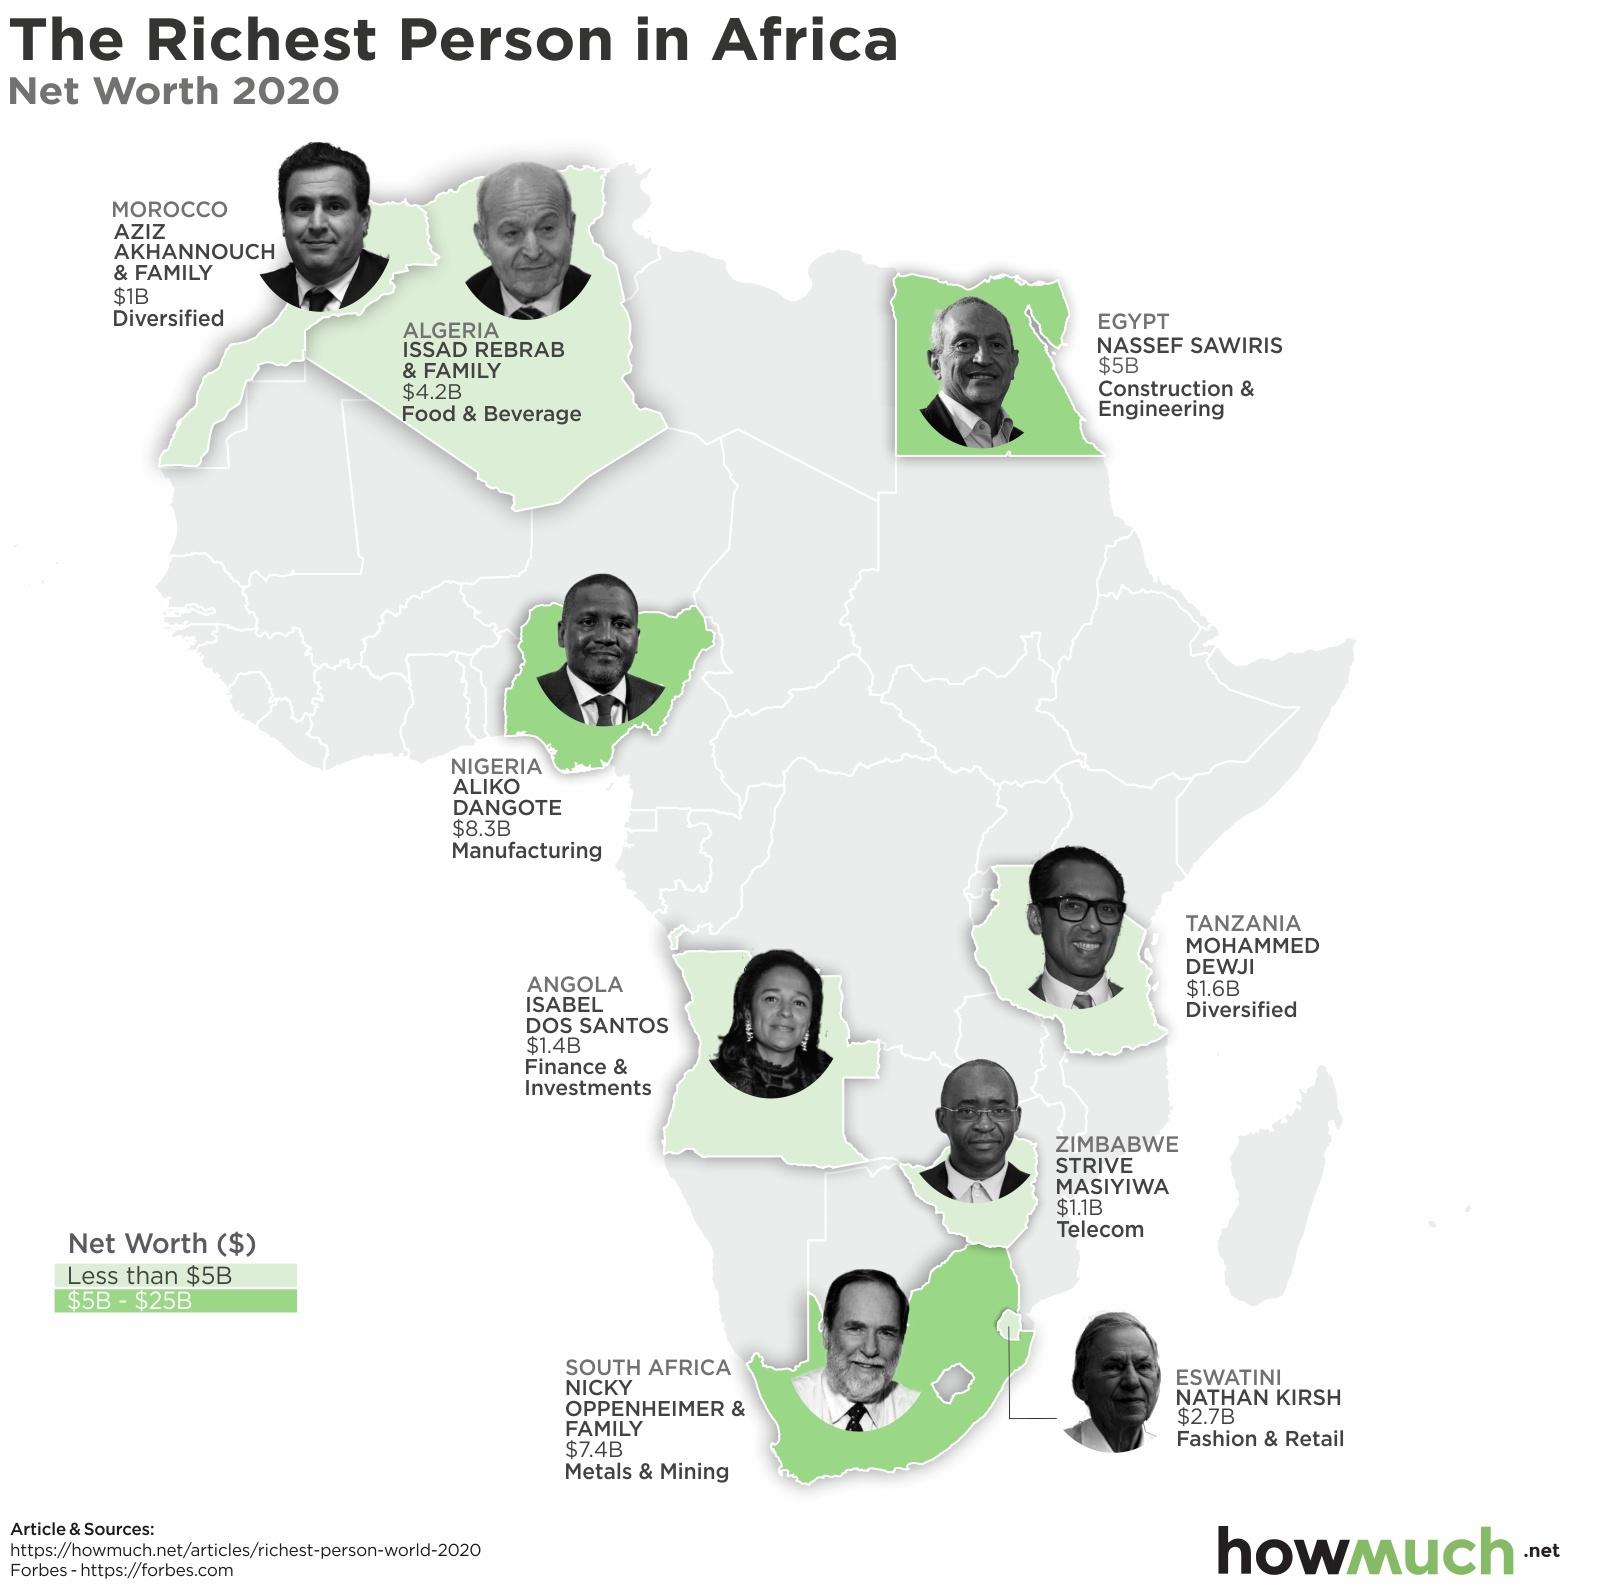 richest person in africa